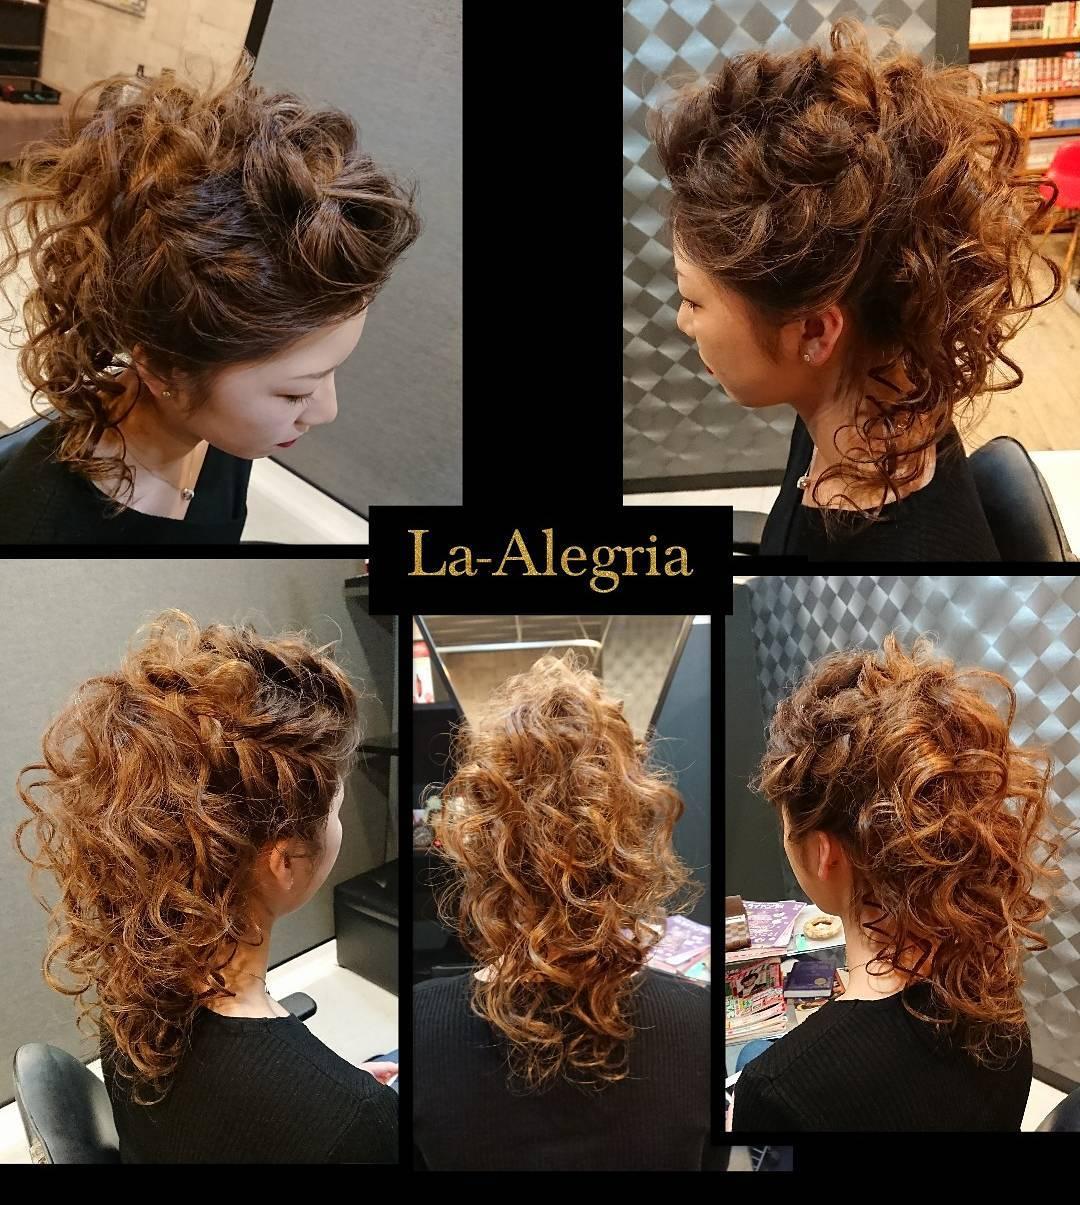 http://beauty-salon-la-alegria-ubecity.com/news/311.jpg